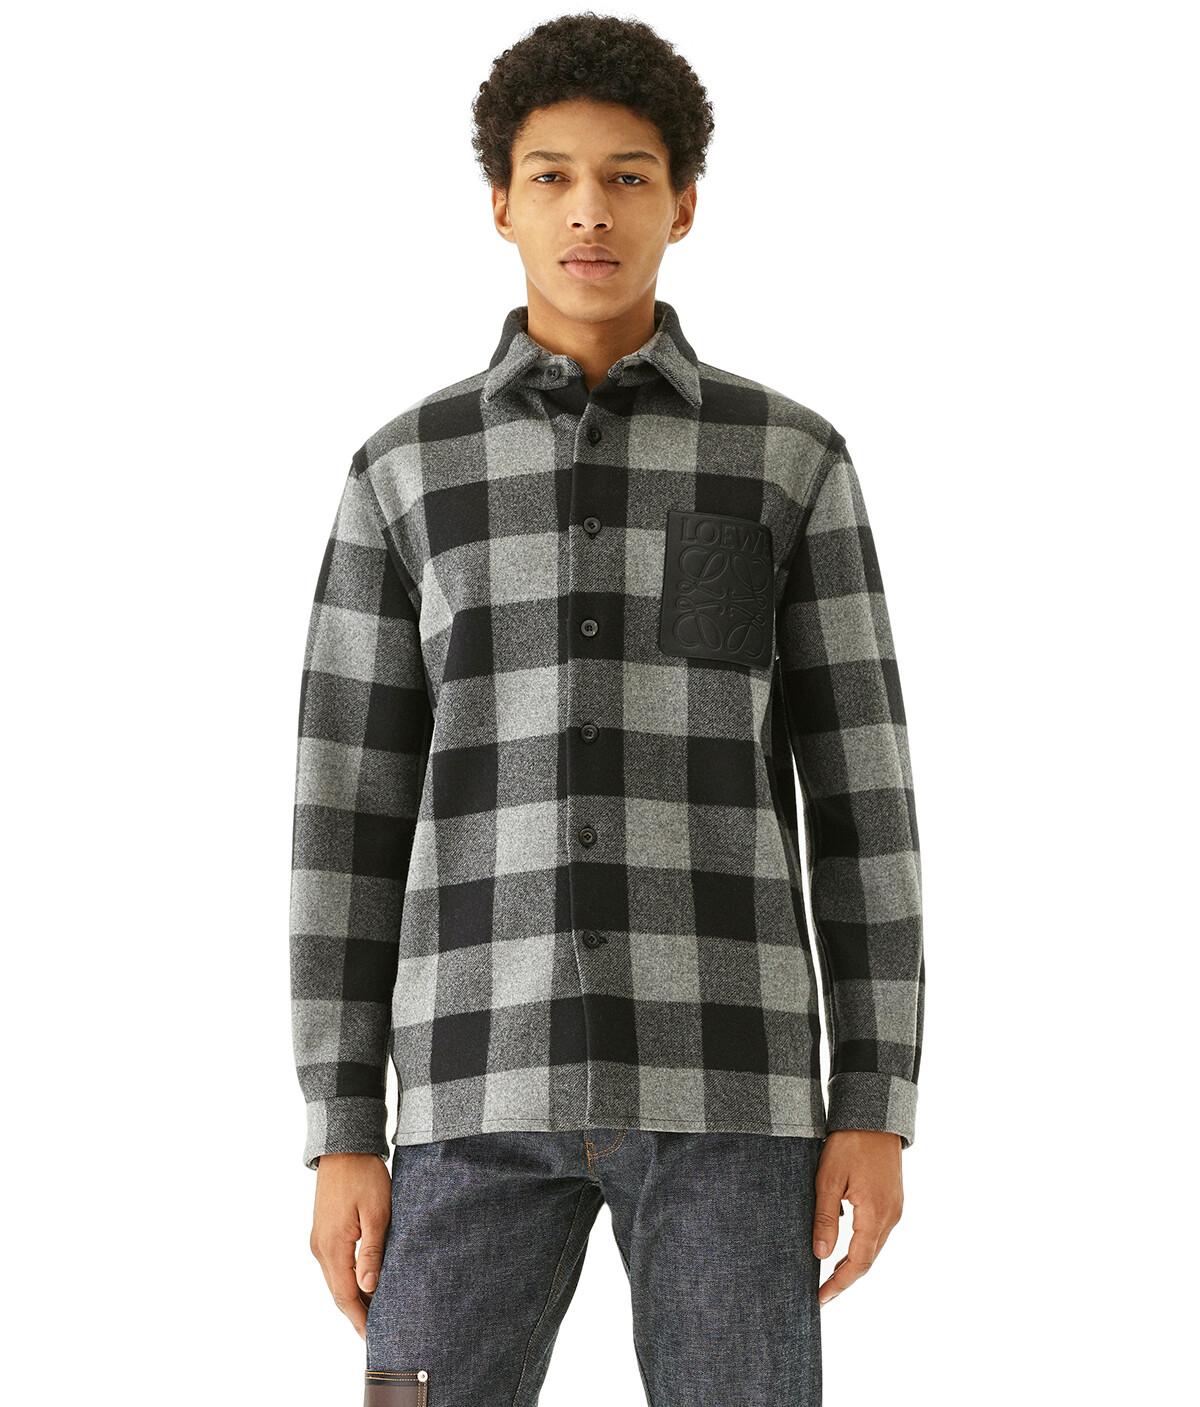 LOEWE Check Overshirt Gris/Negro front